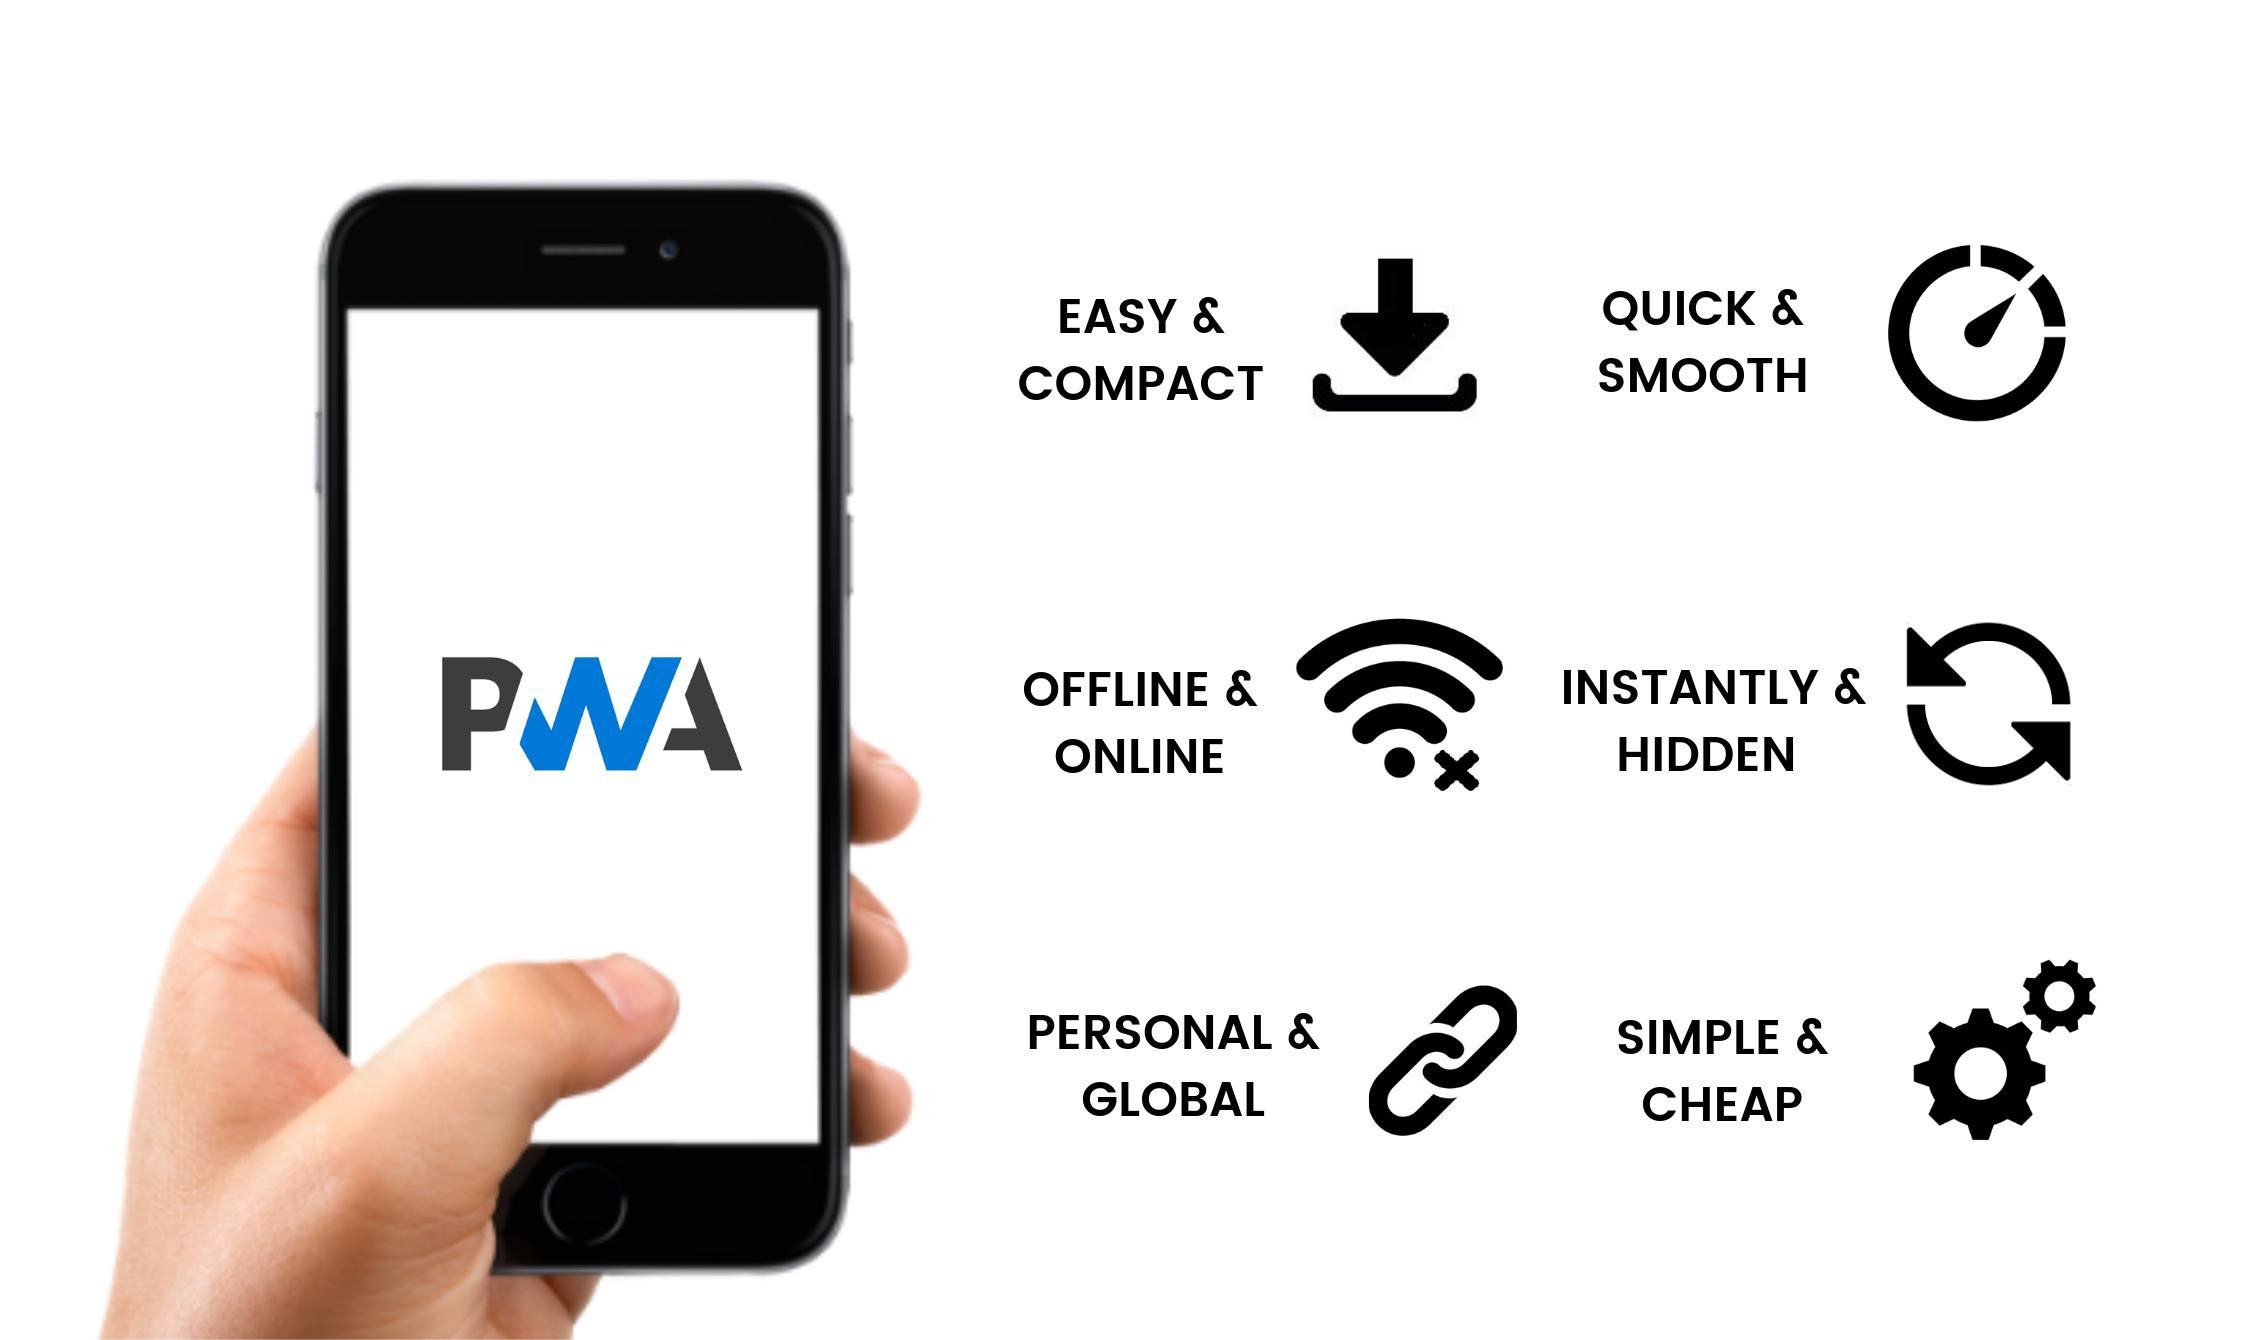 PWA features